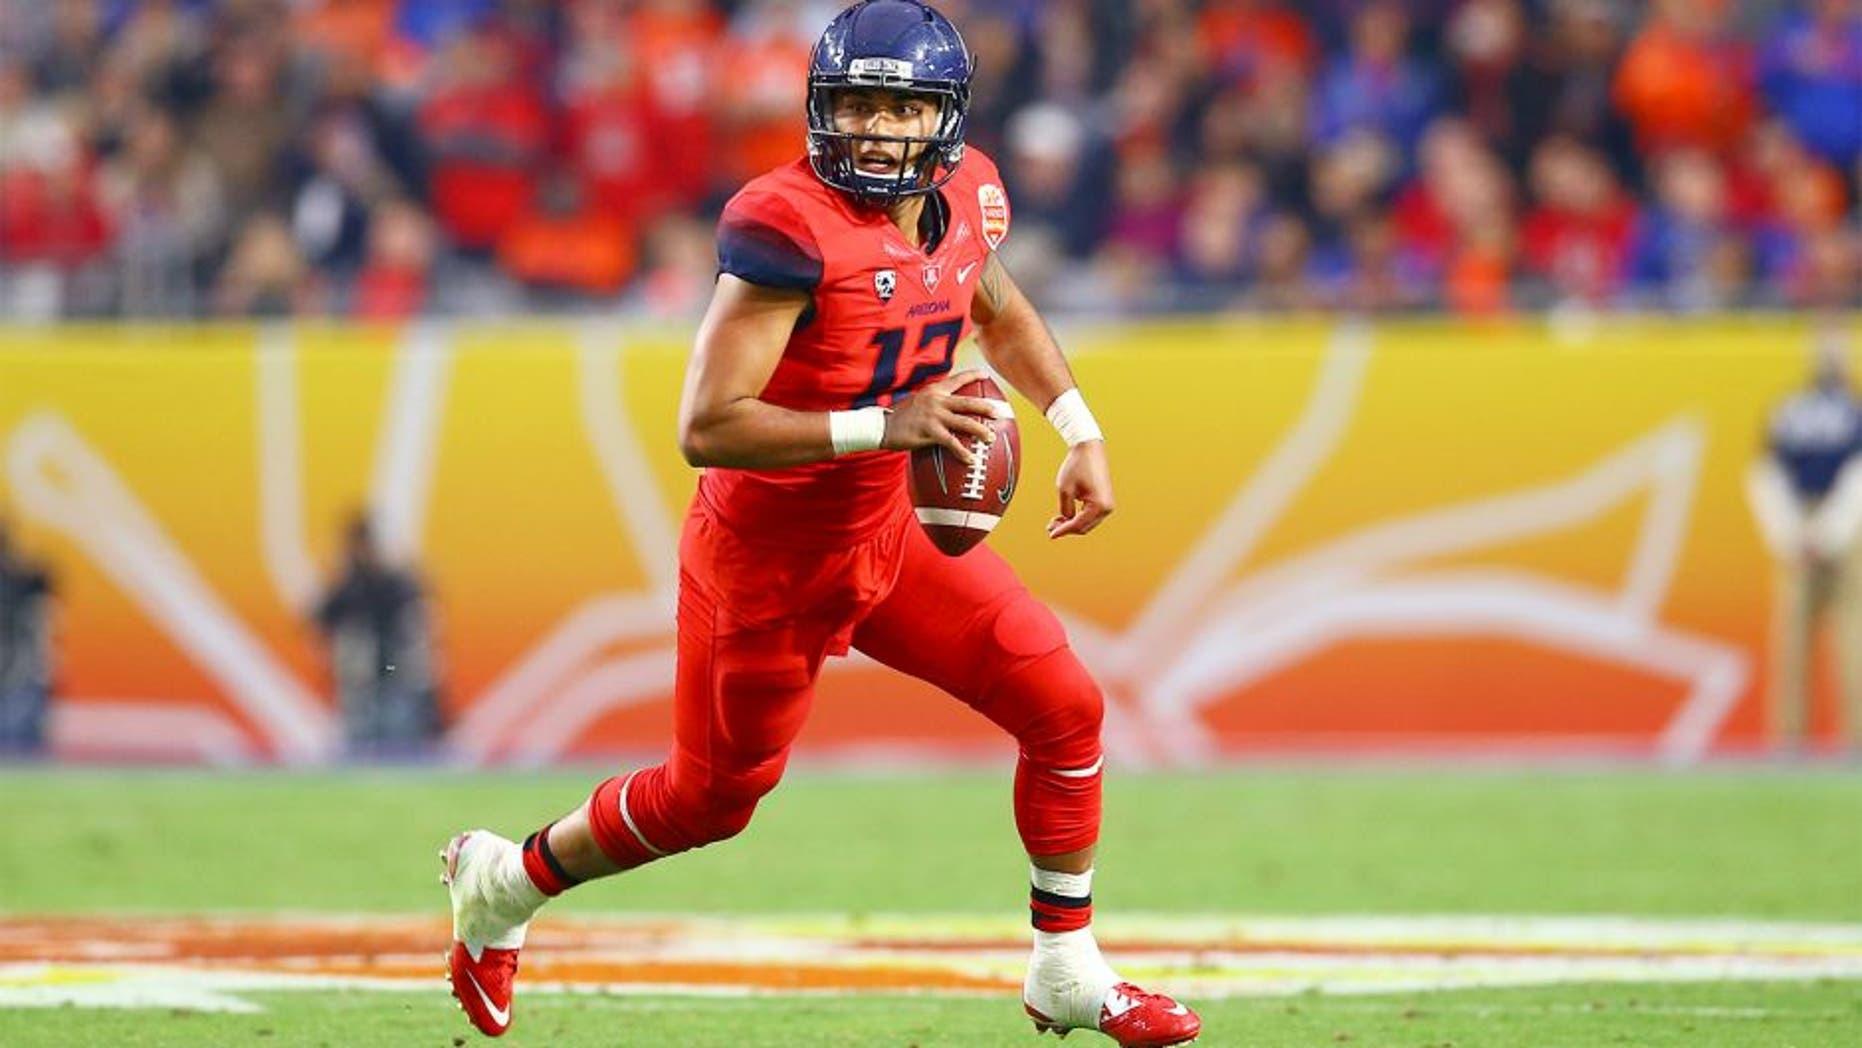 Dec 31, 2014; Glendale, AZ, USA; Arizona Wildcats quarterback Anu Solomon (12) scrambles in the second quarter against the Boise State Broncos in the 2014 Fiesta Bowl at Phoenix Stadium. Mandatory Credit: Mark J. Rebilas-USA TODAY Sports